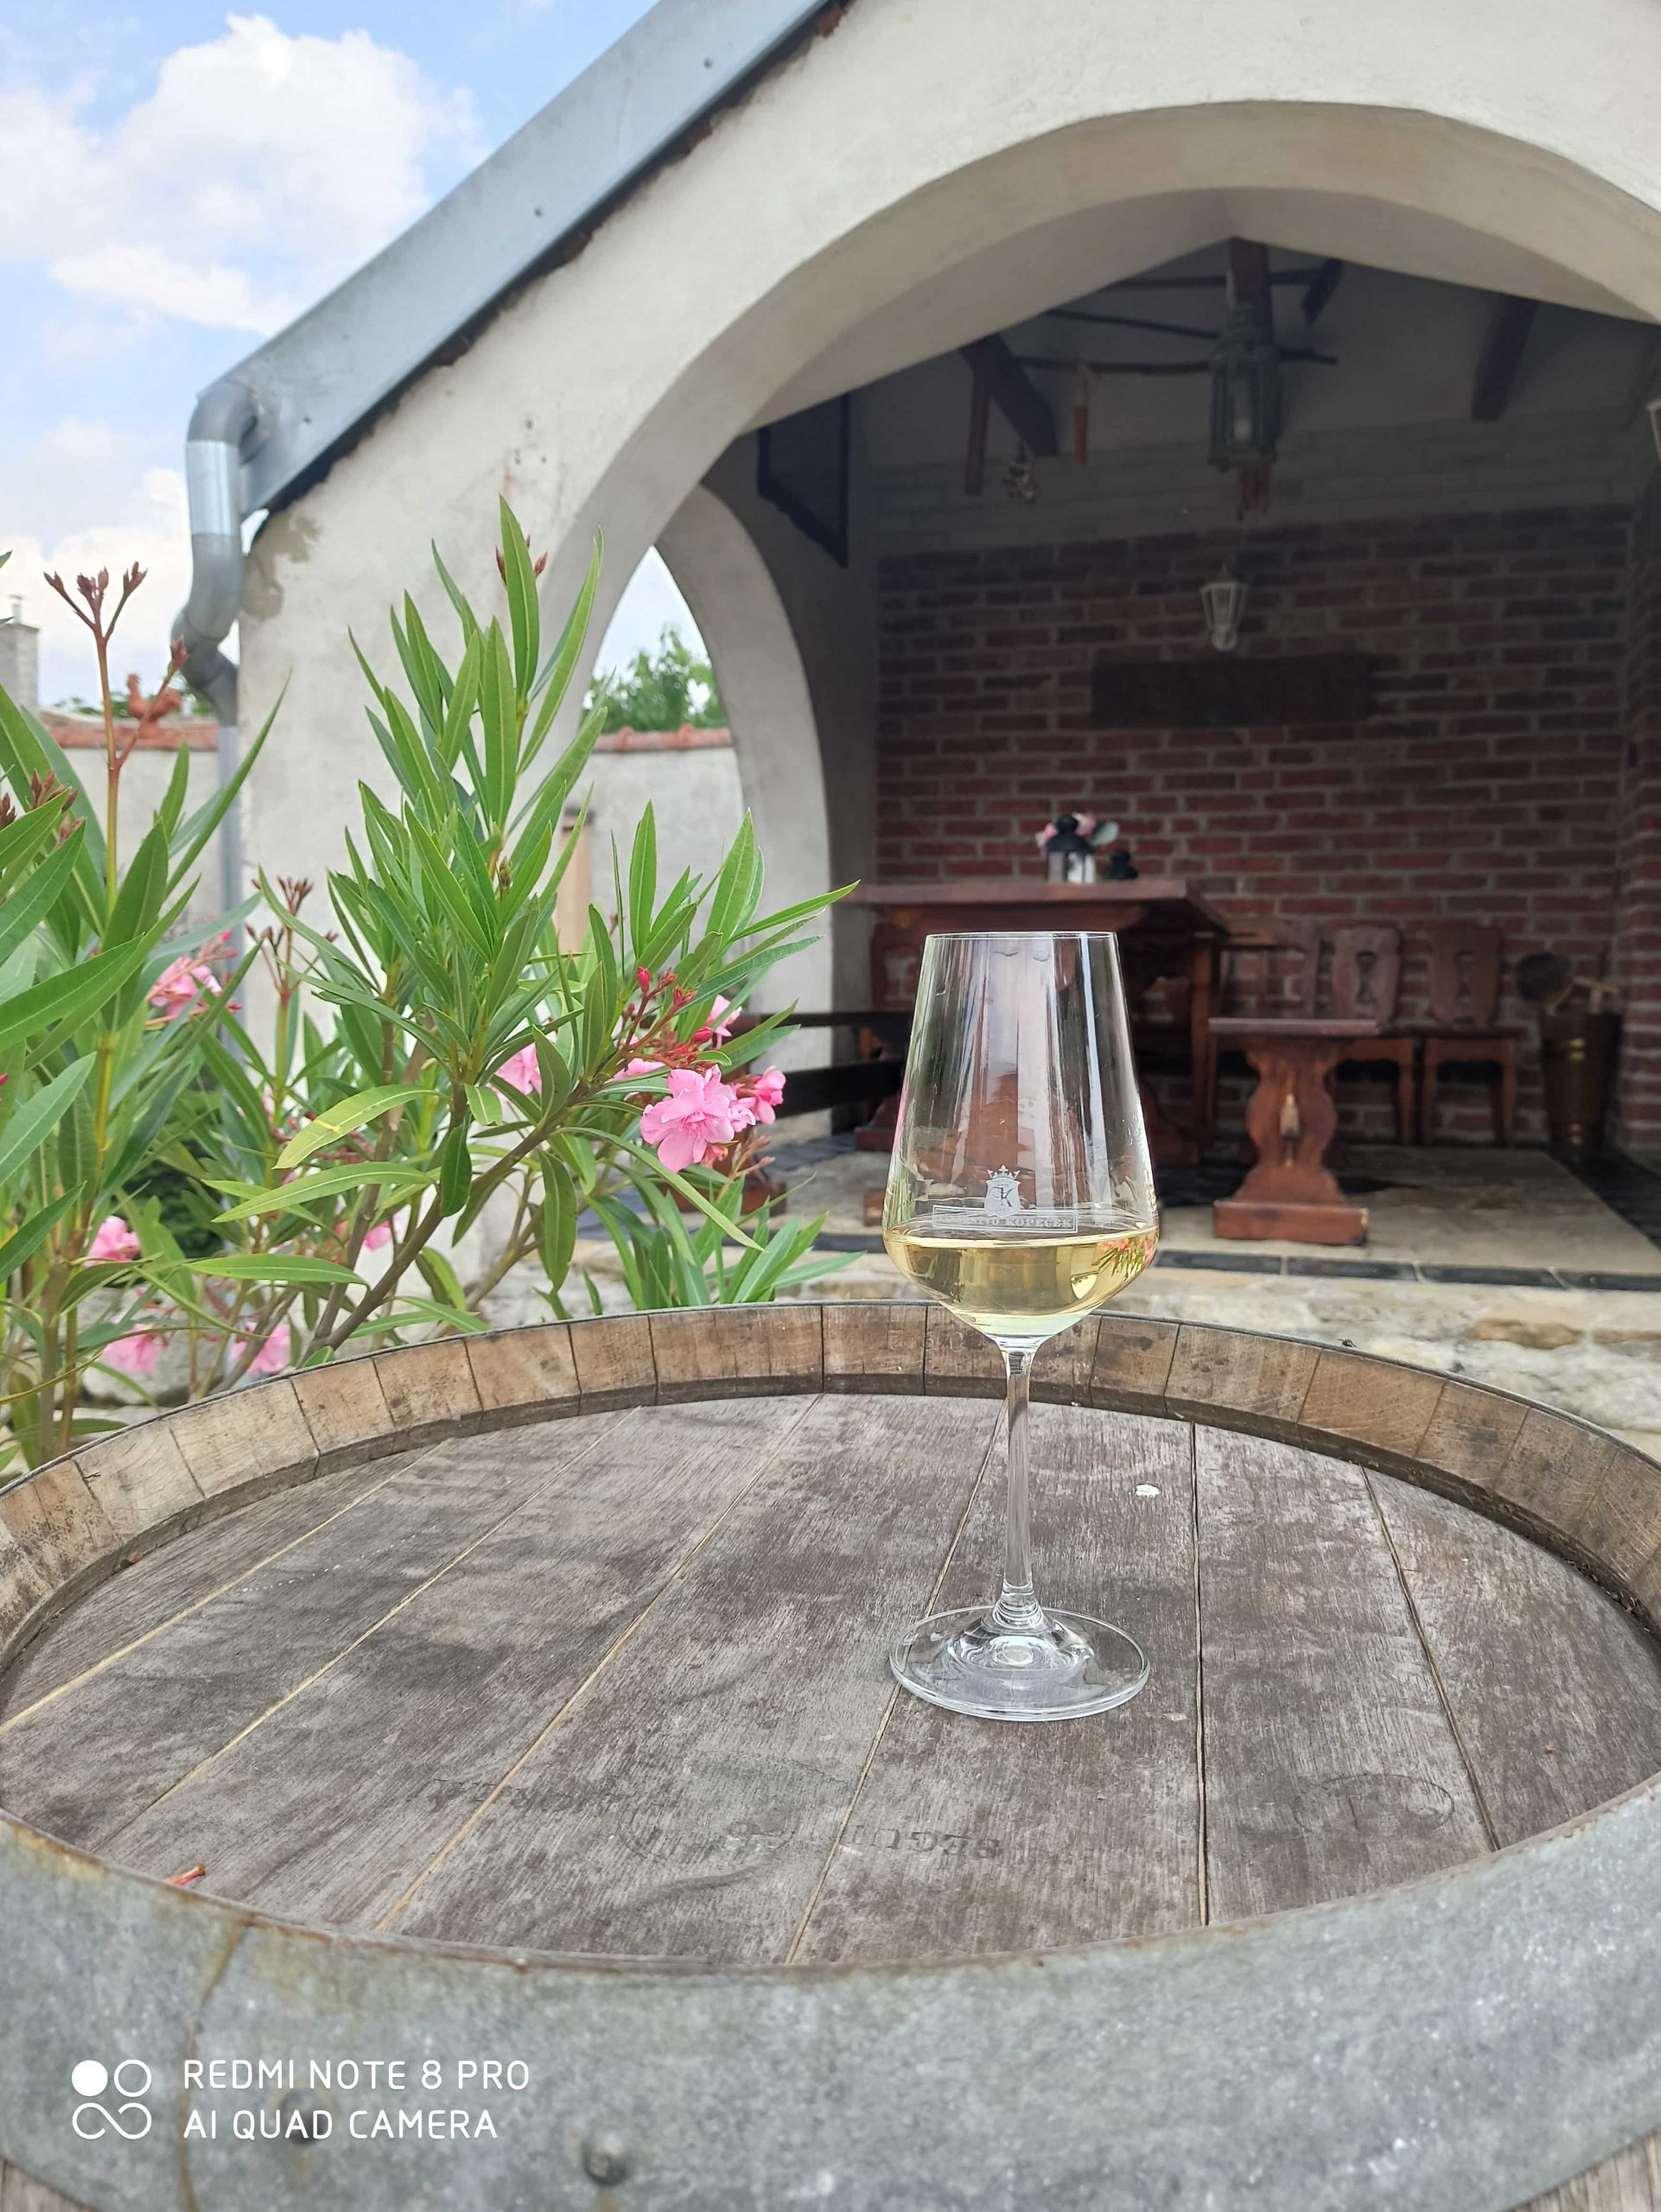 vinarstvo1_Vinarstvo Kopecek-min